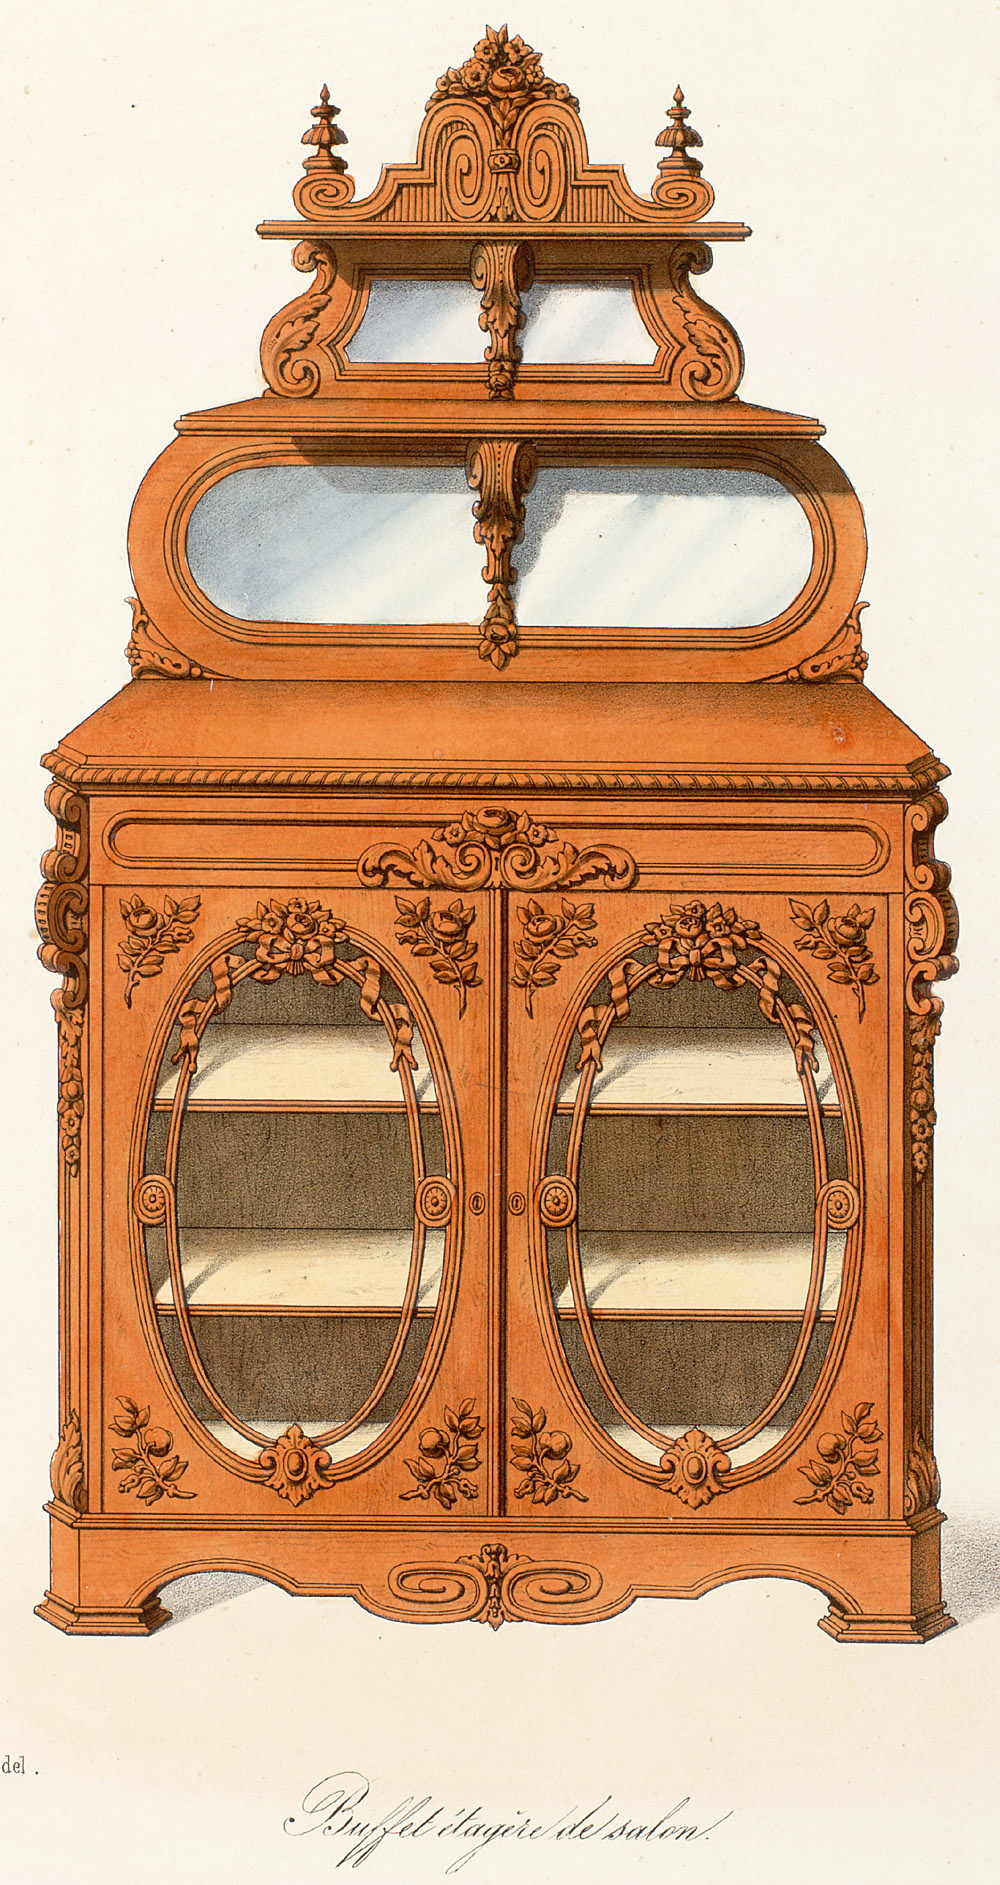 Cabinets (case furniture),  Image number:SIL12-2-417b